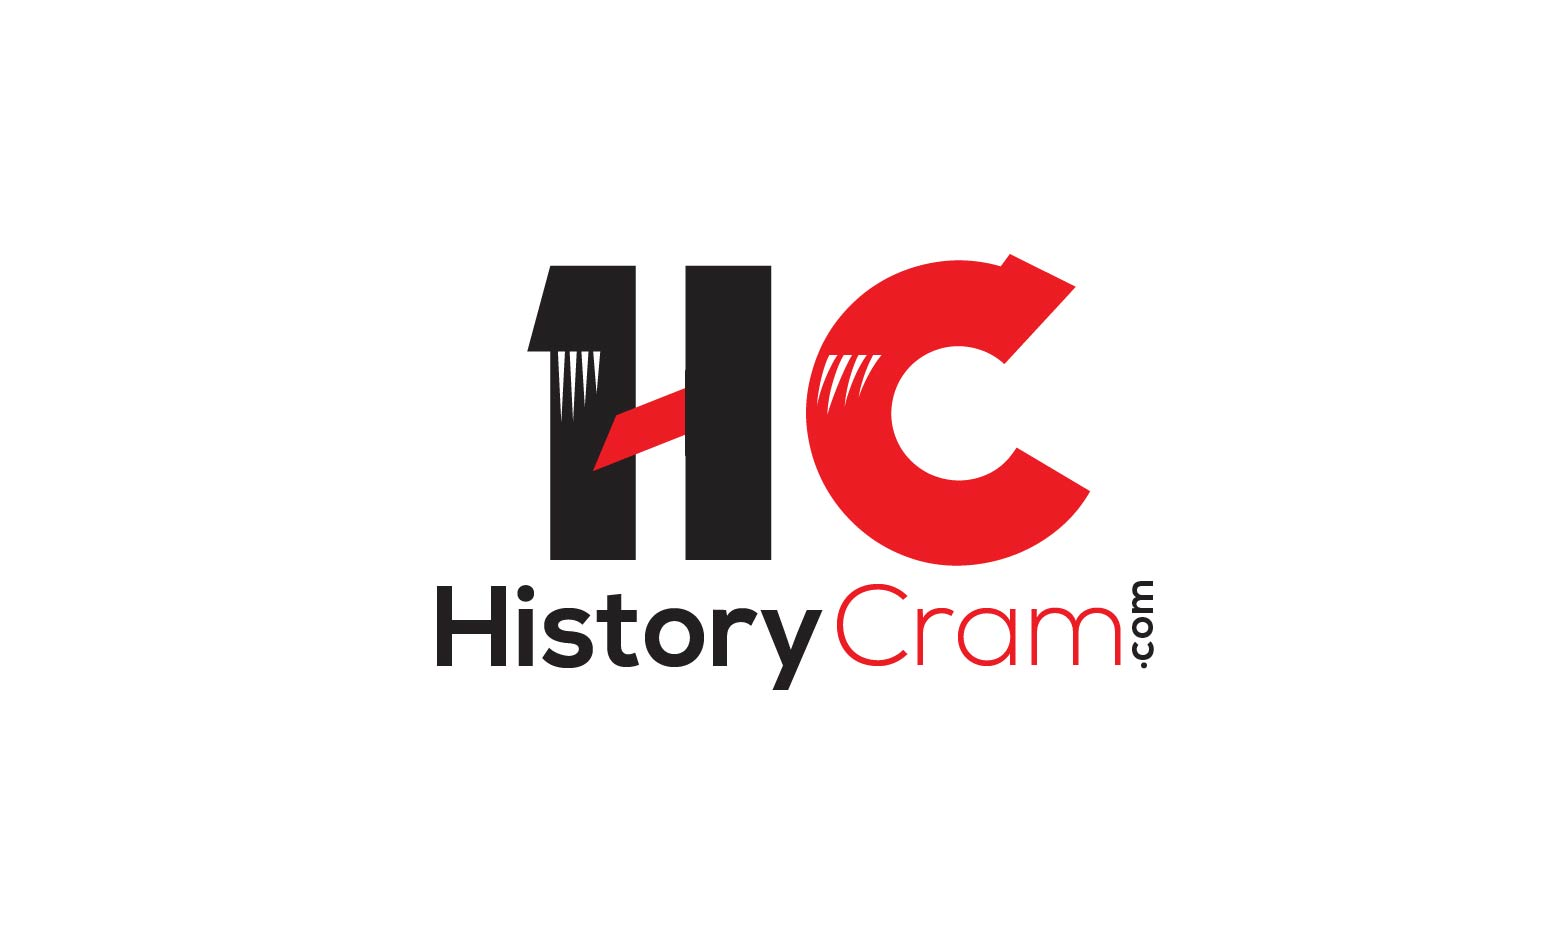 HistoryCram